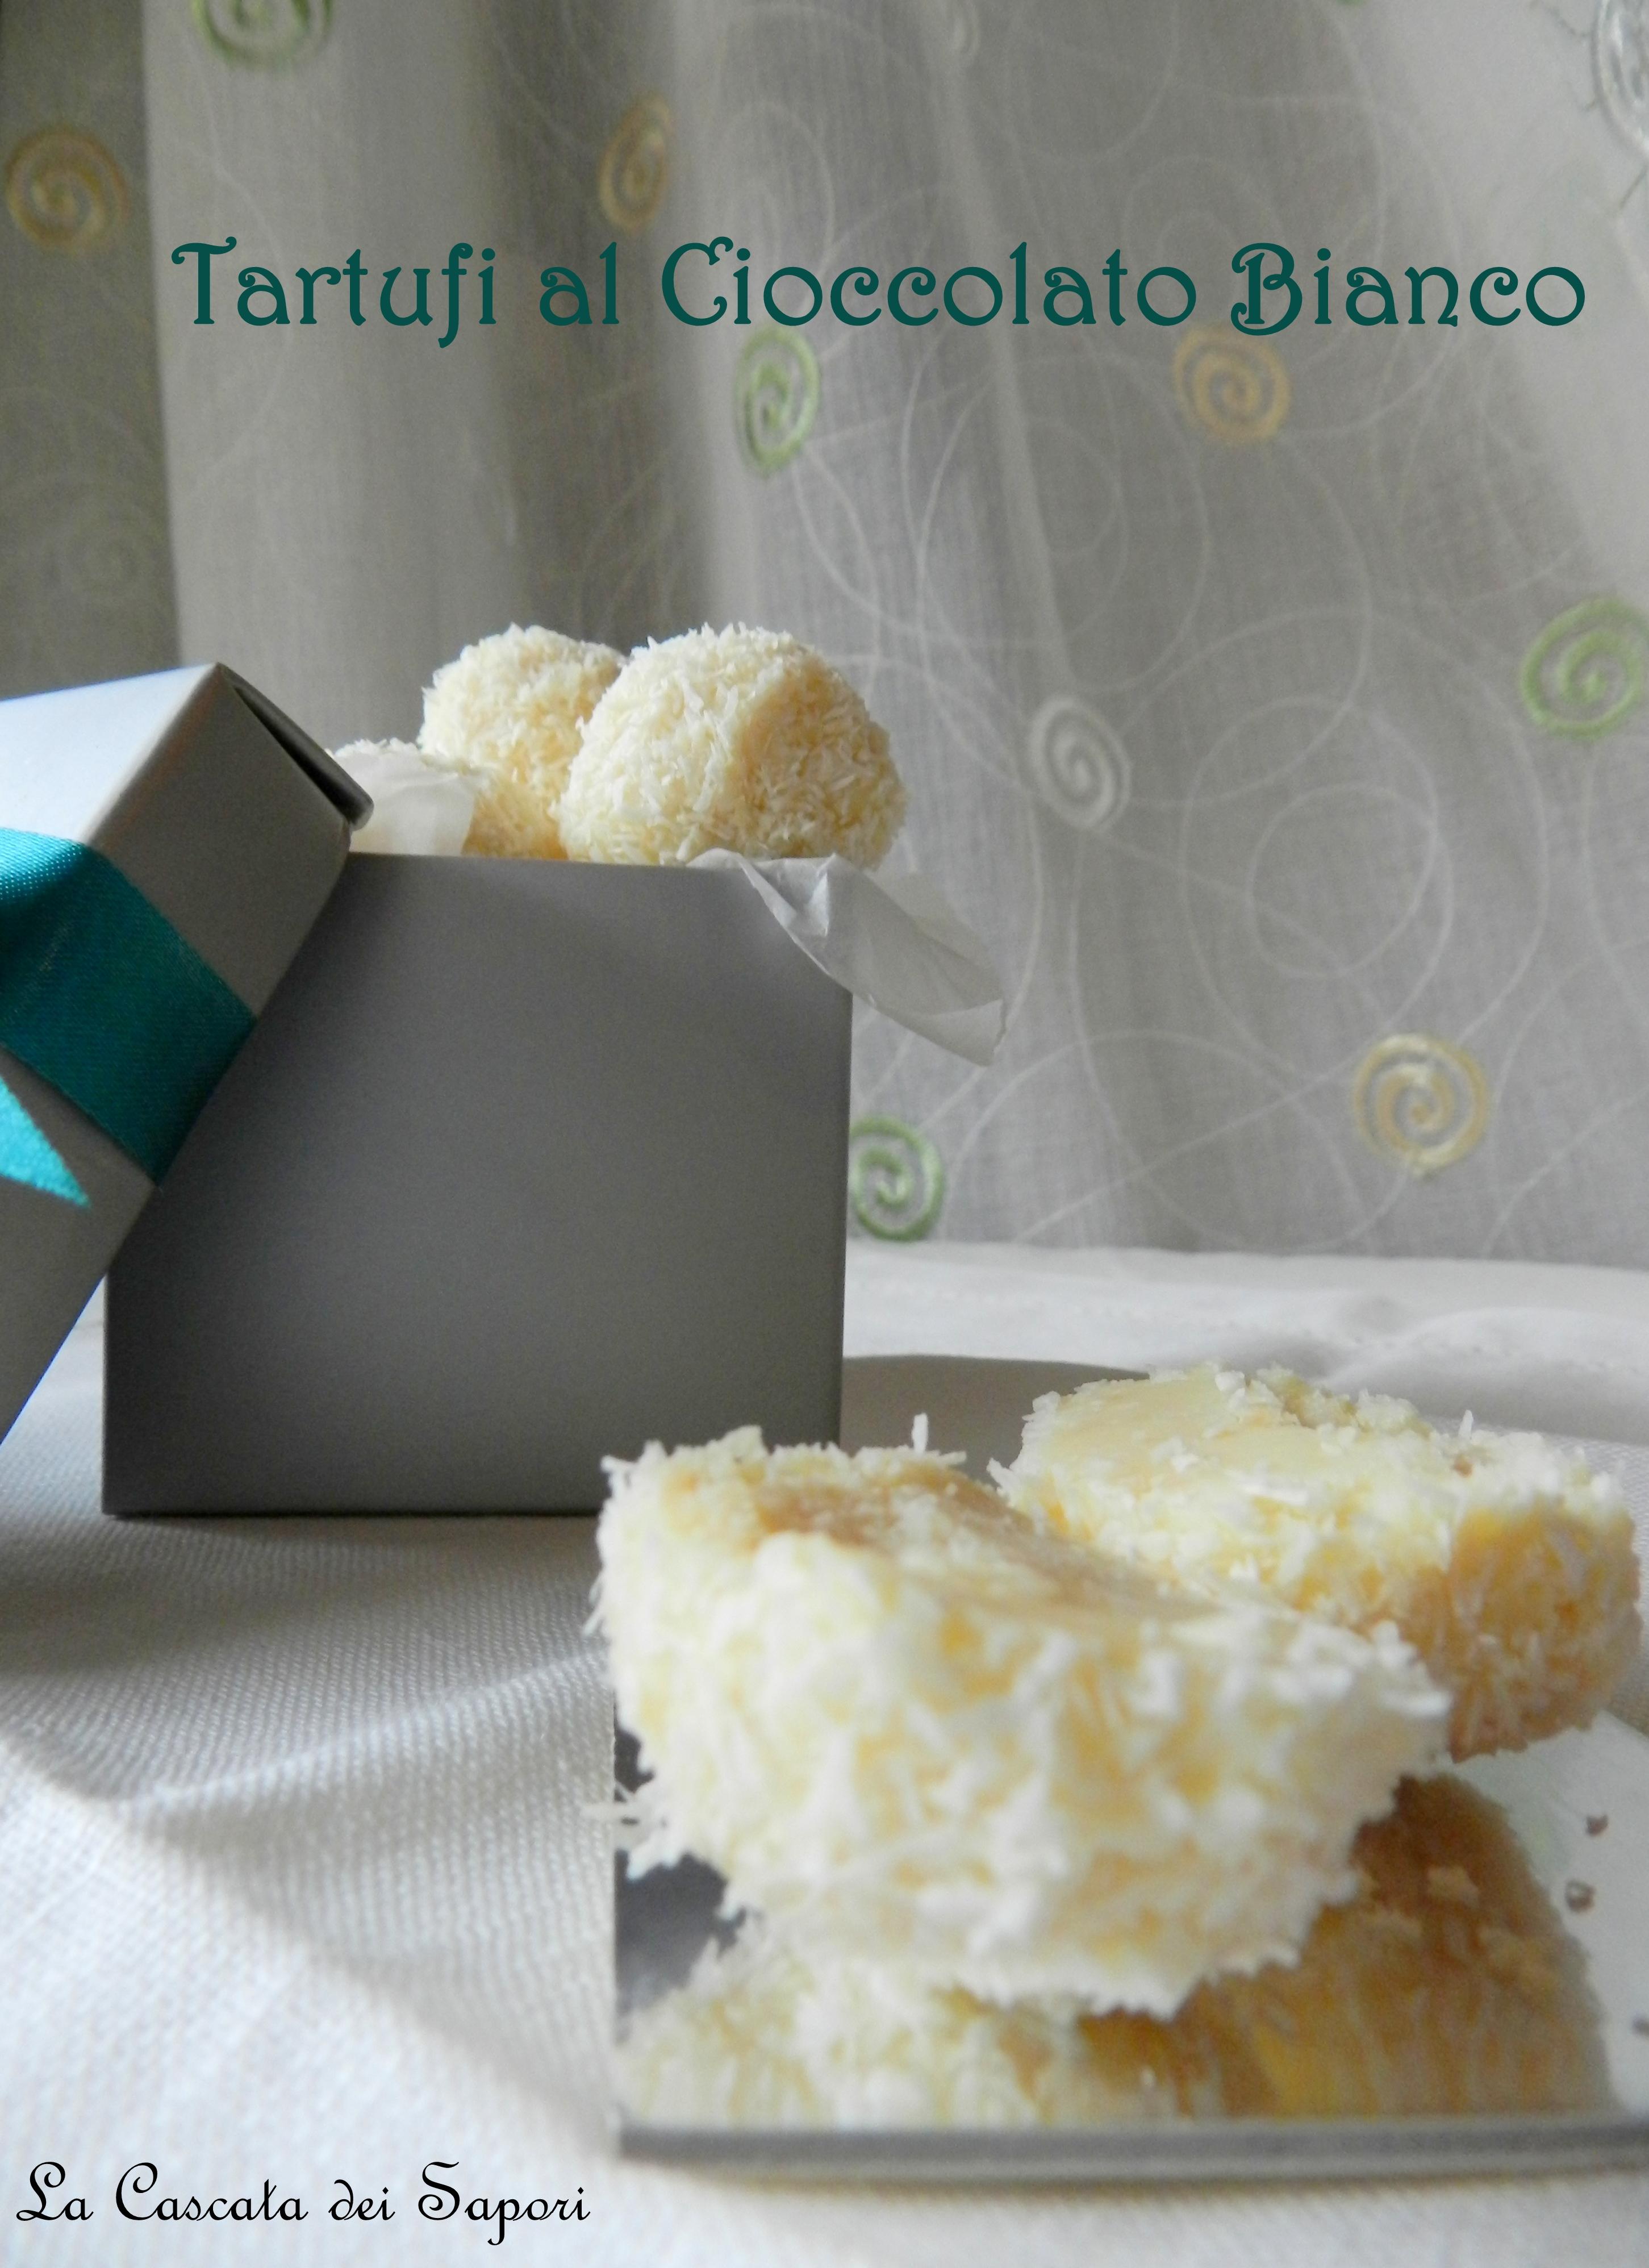 Tartufi-al-cioccolato-bianco-anacardi-e-cocco